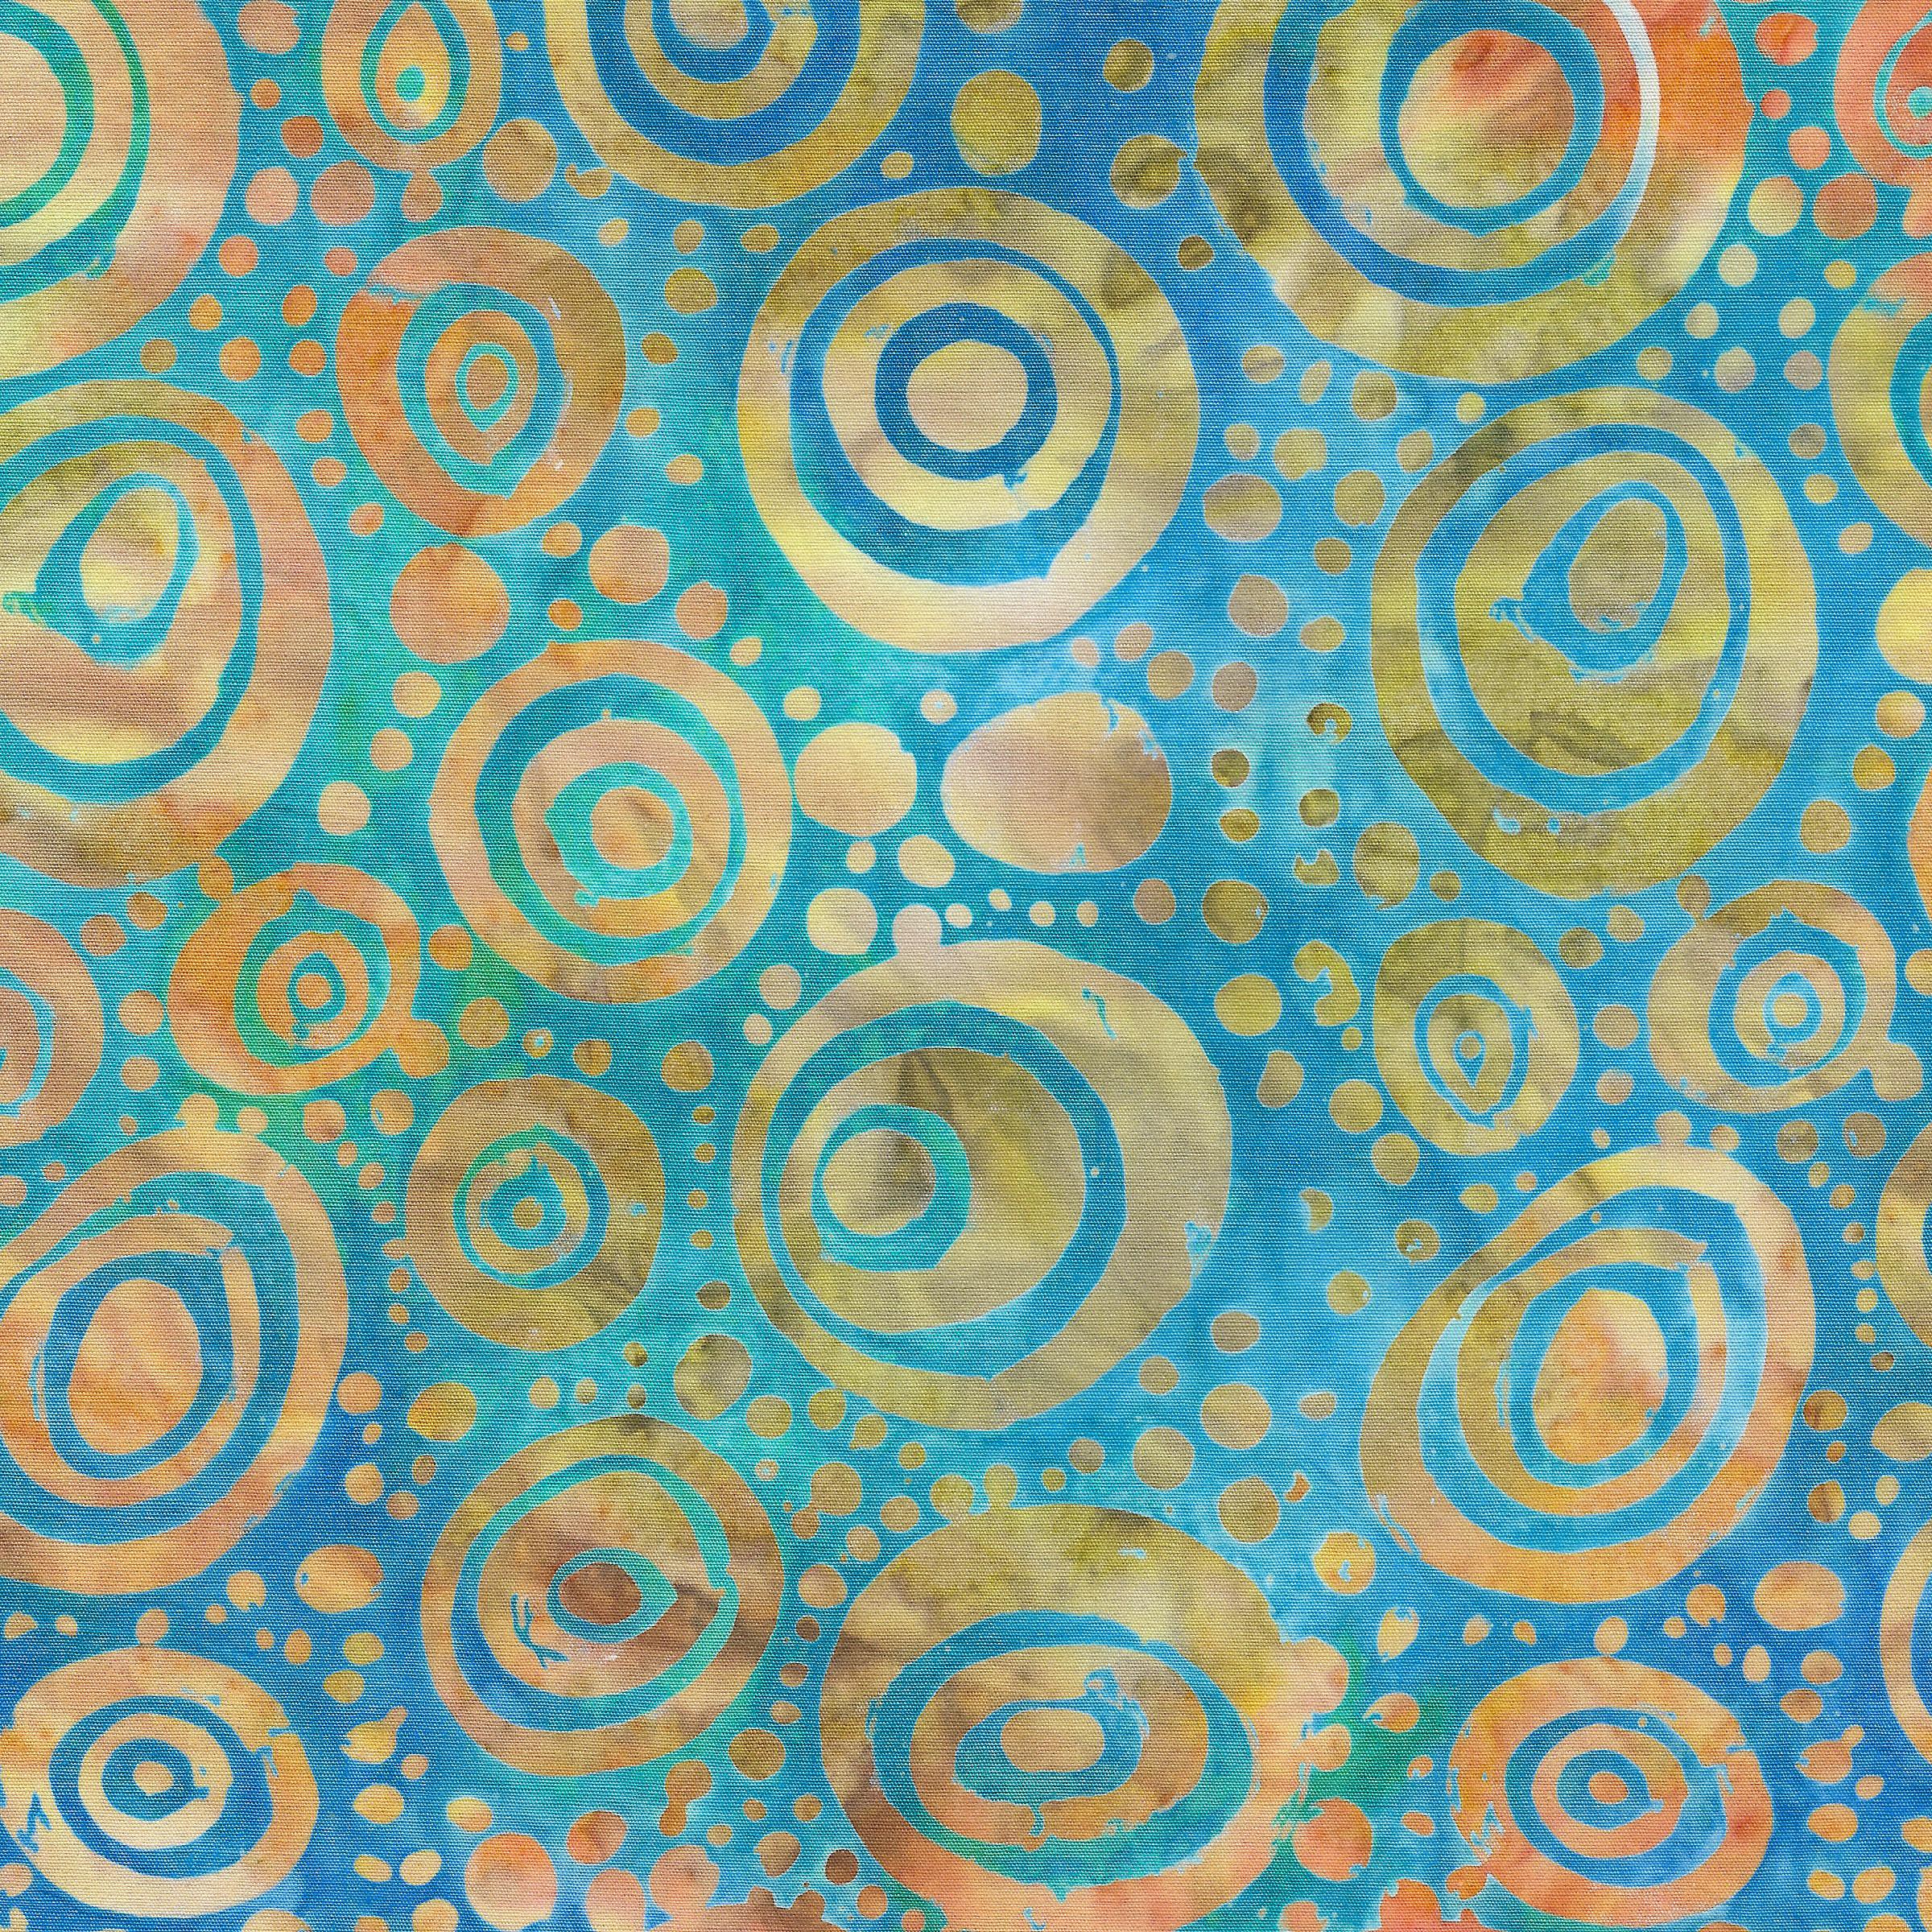 Island Batik Circles -Teal 821801561